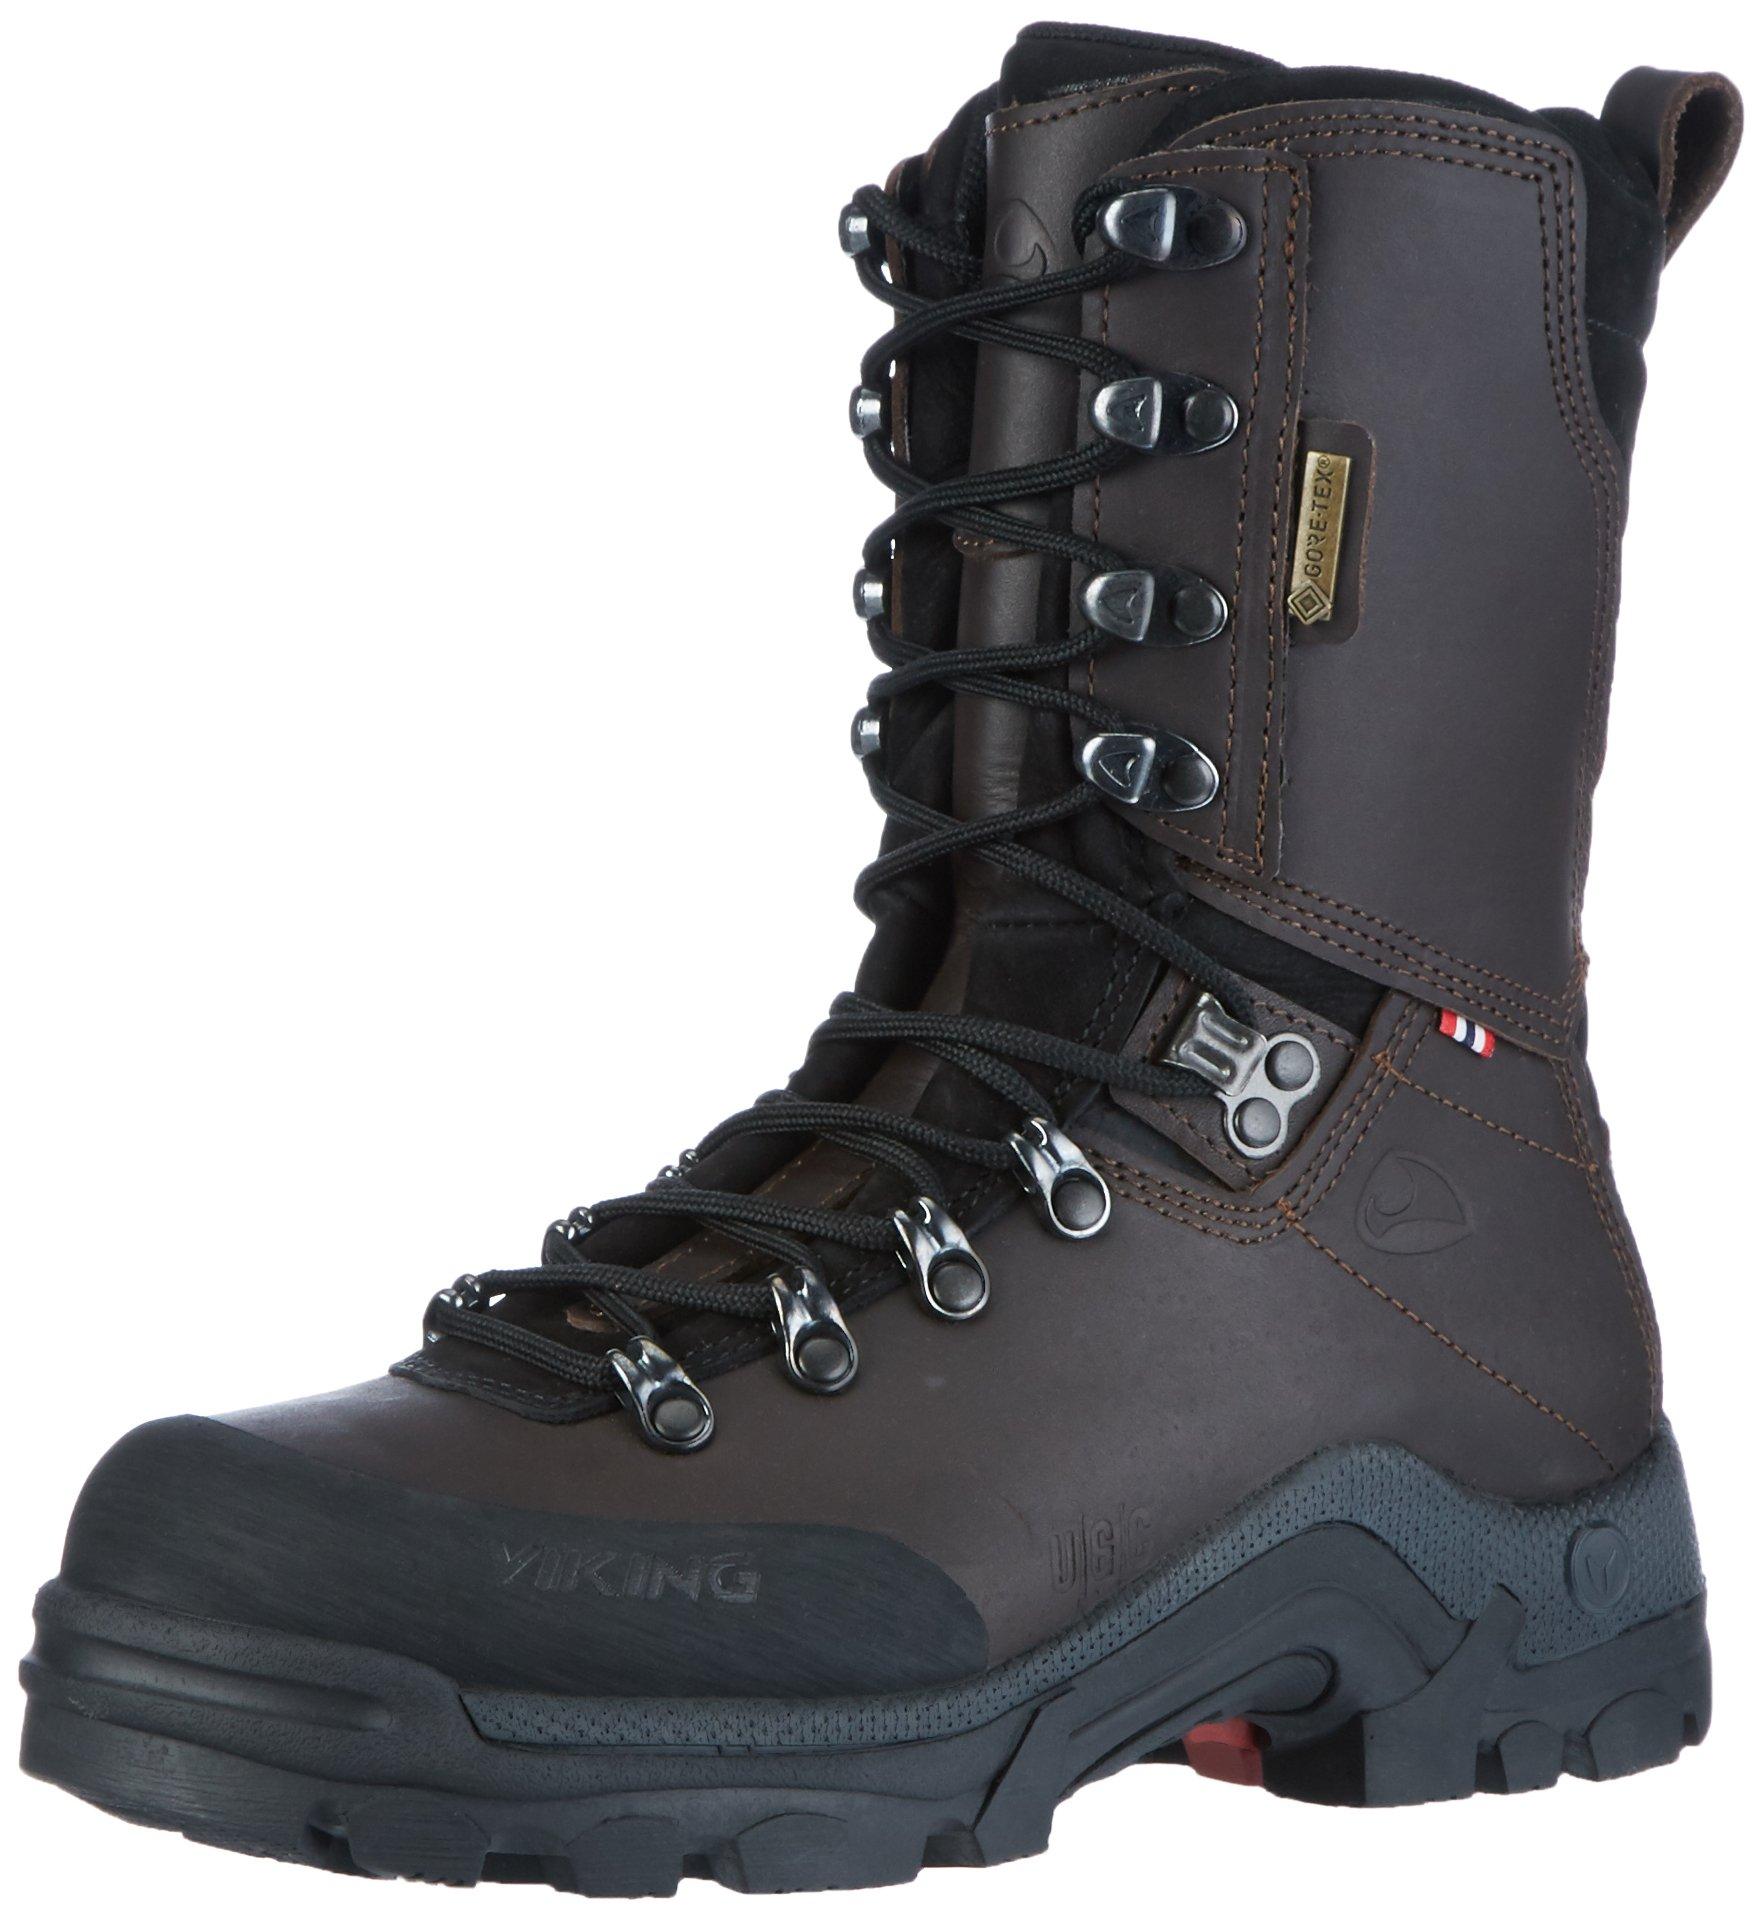 Viking Unisex Adults' Hunter GTX Hunting Shoes, Brown (Dark Brown 18), 3.5 UK